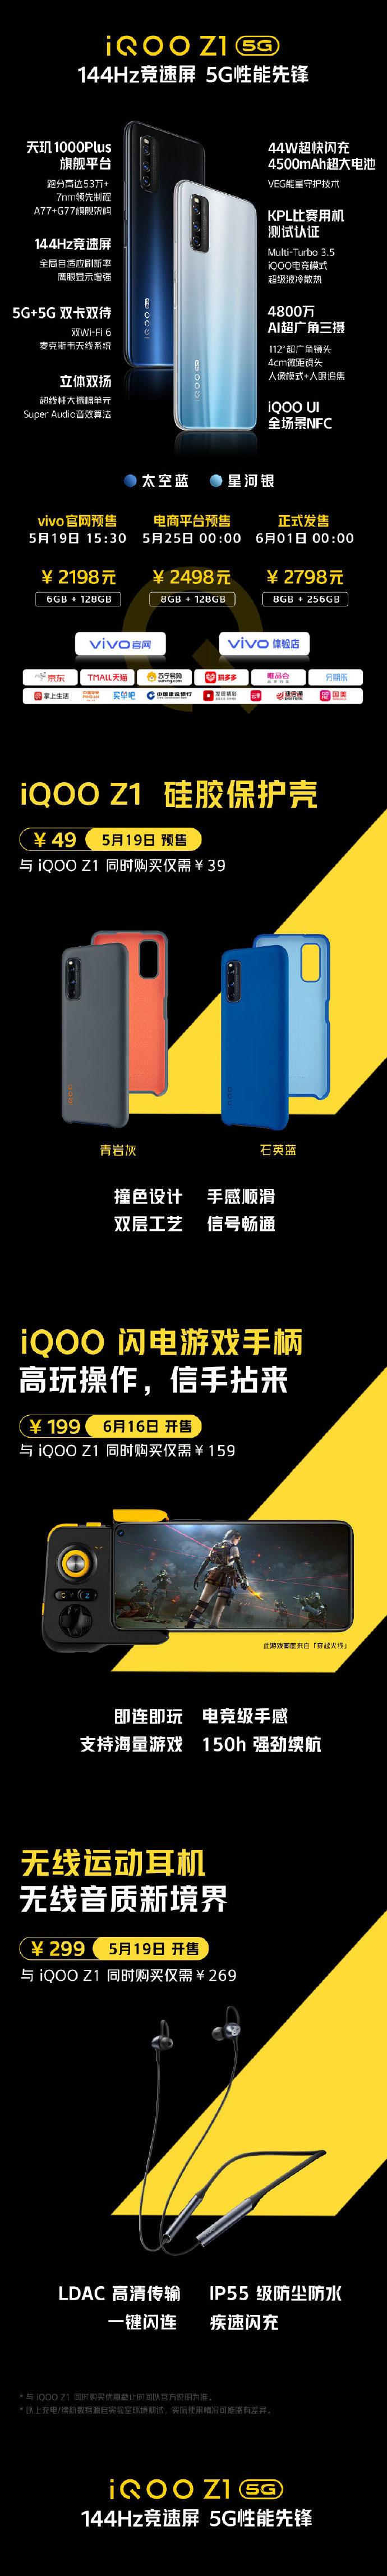 5G-SoC-1000Plus_05